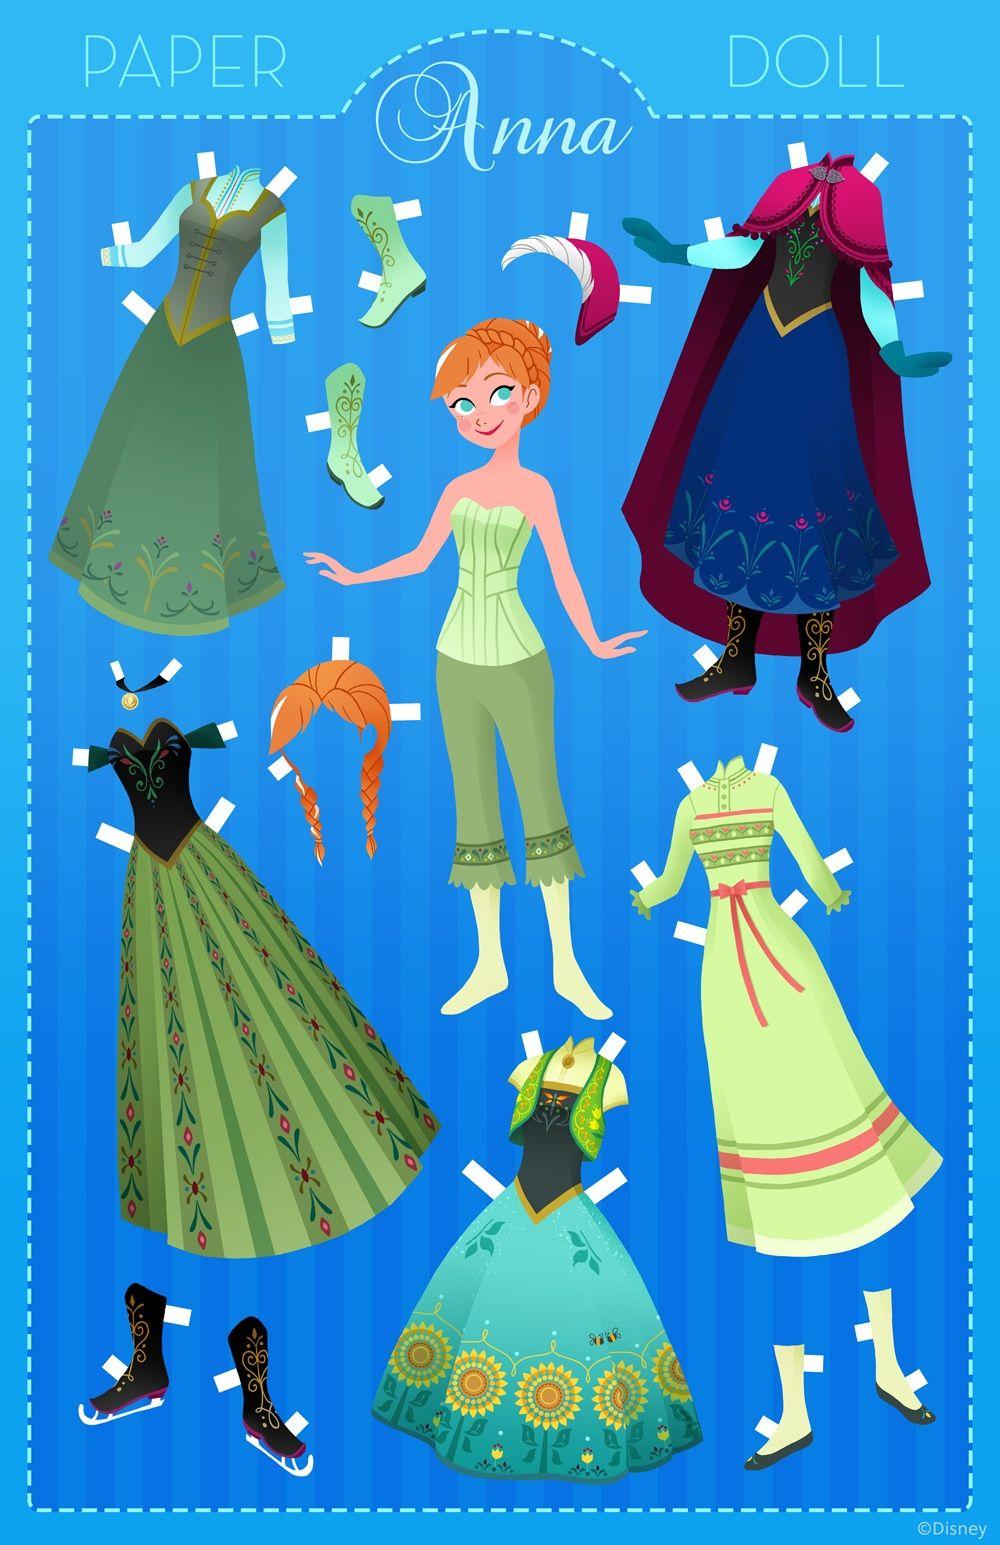 Disney Anna Free Paper Doll Kid's Craft Printables ! ( They have paper doll Printables for all the Disney Princess )